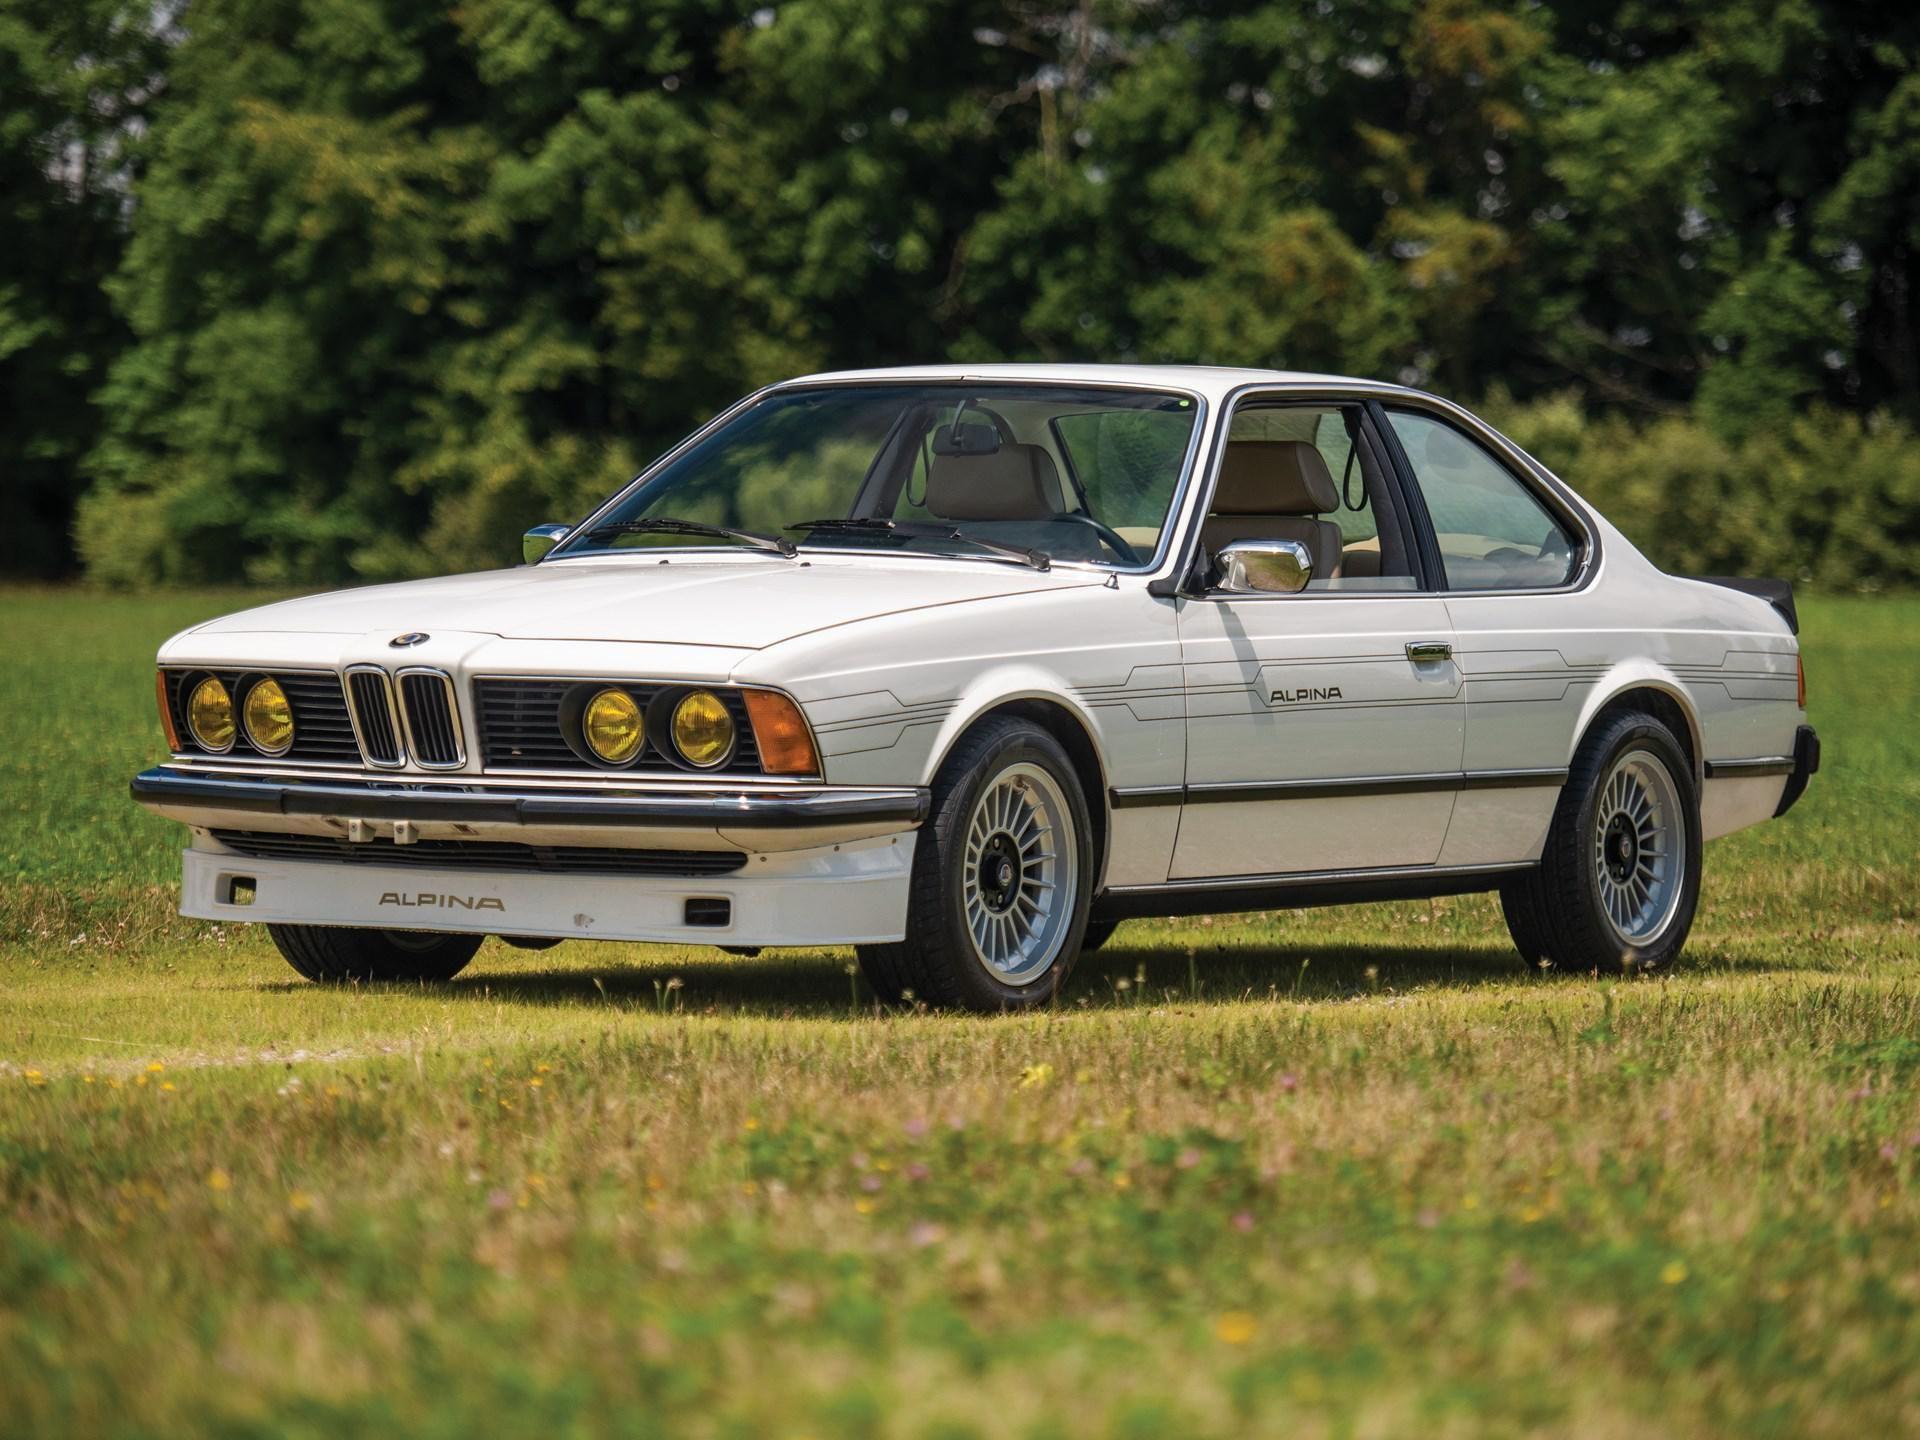 1982 BMW Alpina B7 Turbo Coupe